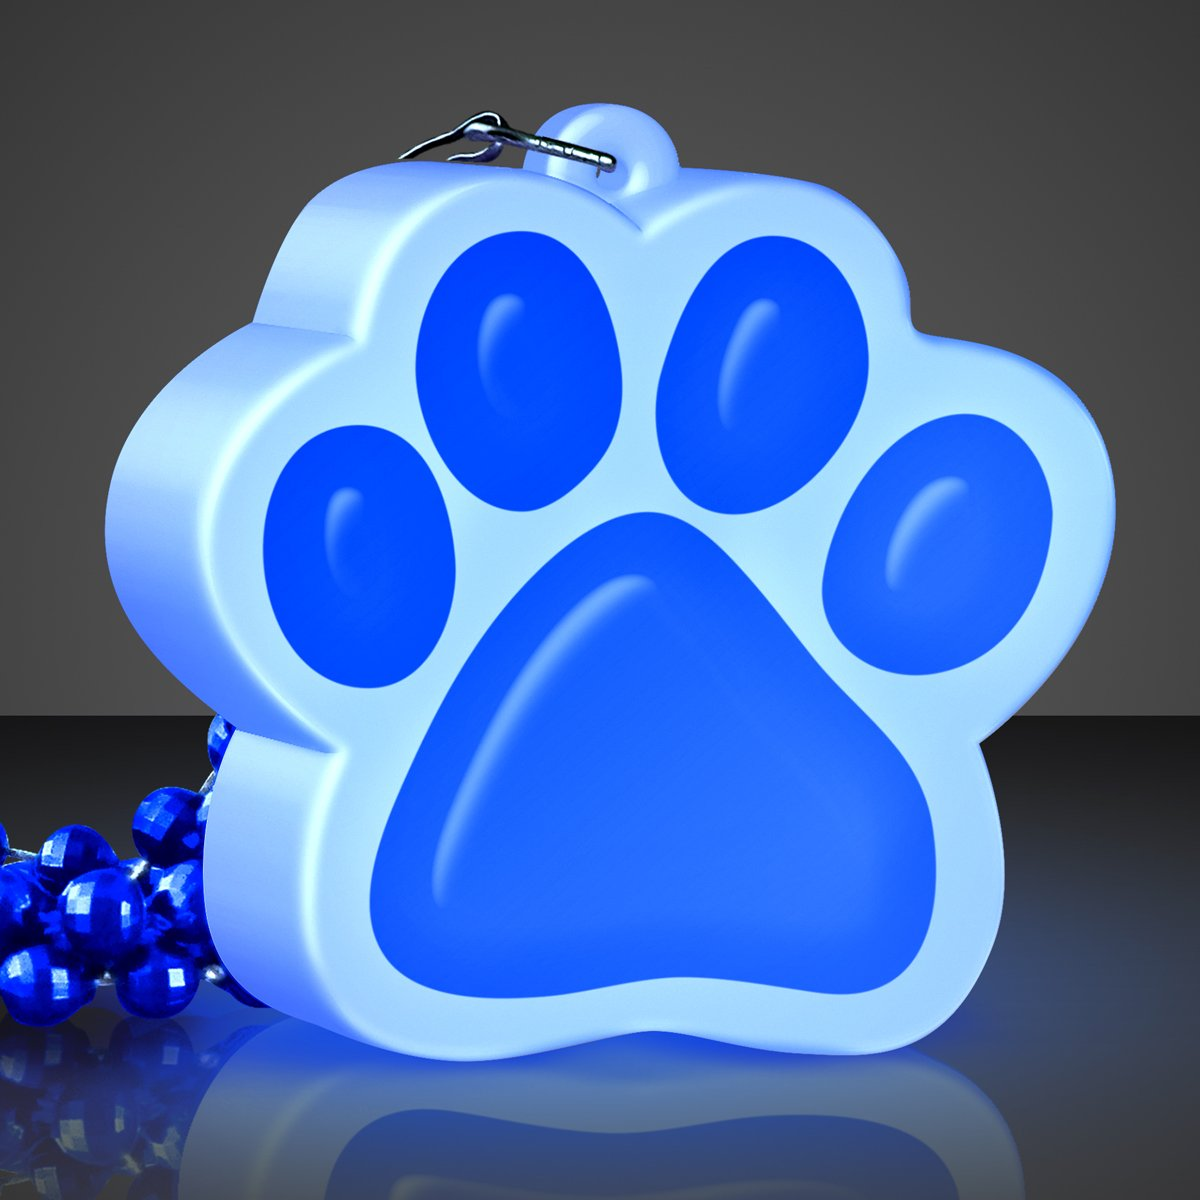 FlashingBlinkyLights Light Up Blue Paw Print Charm Necklace (Set of 12)